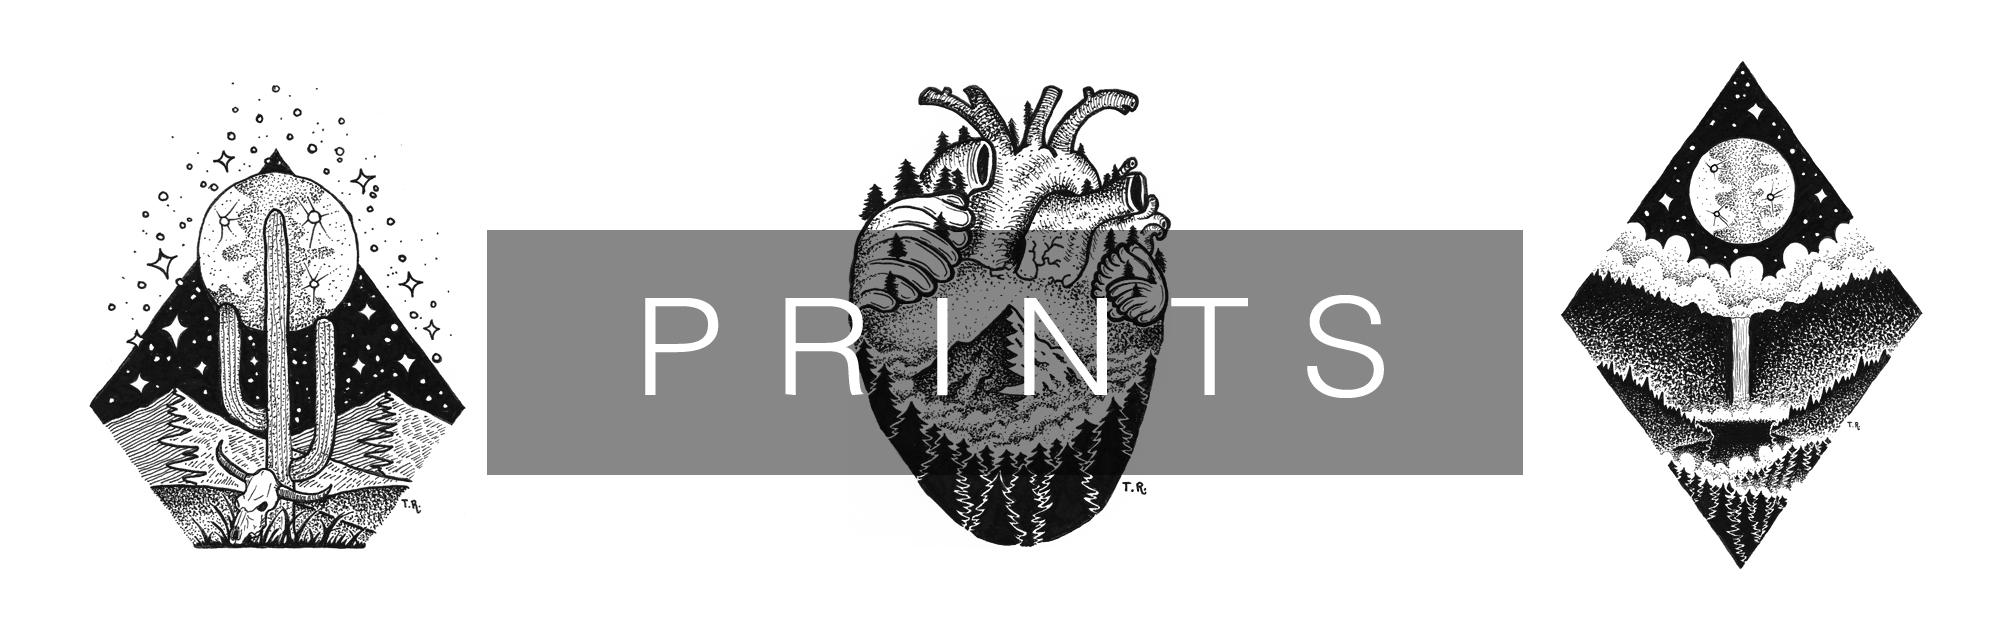 print slideshow5a.png